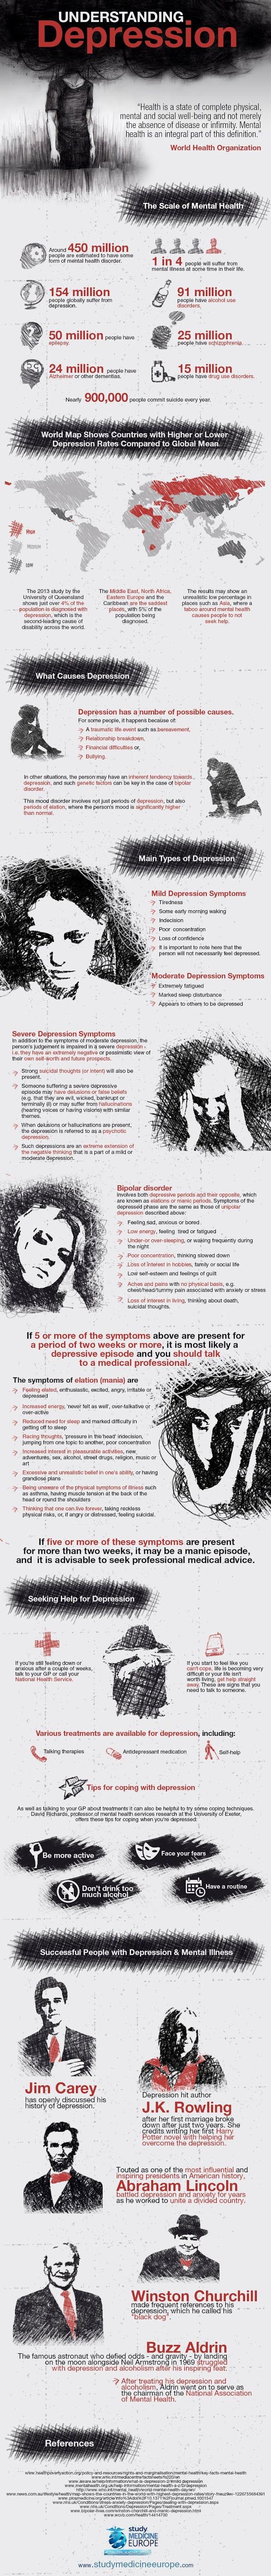 Understanding depression #infographic